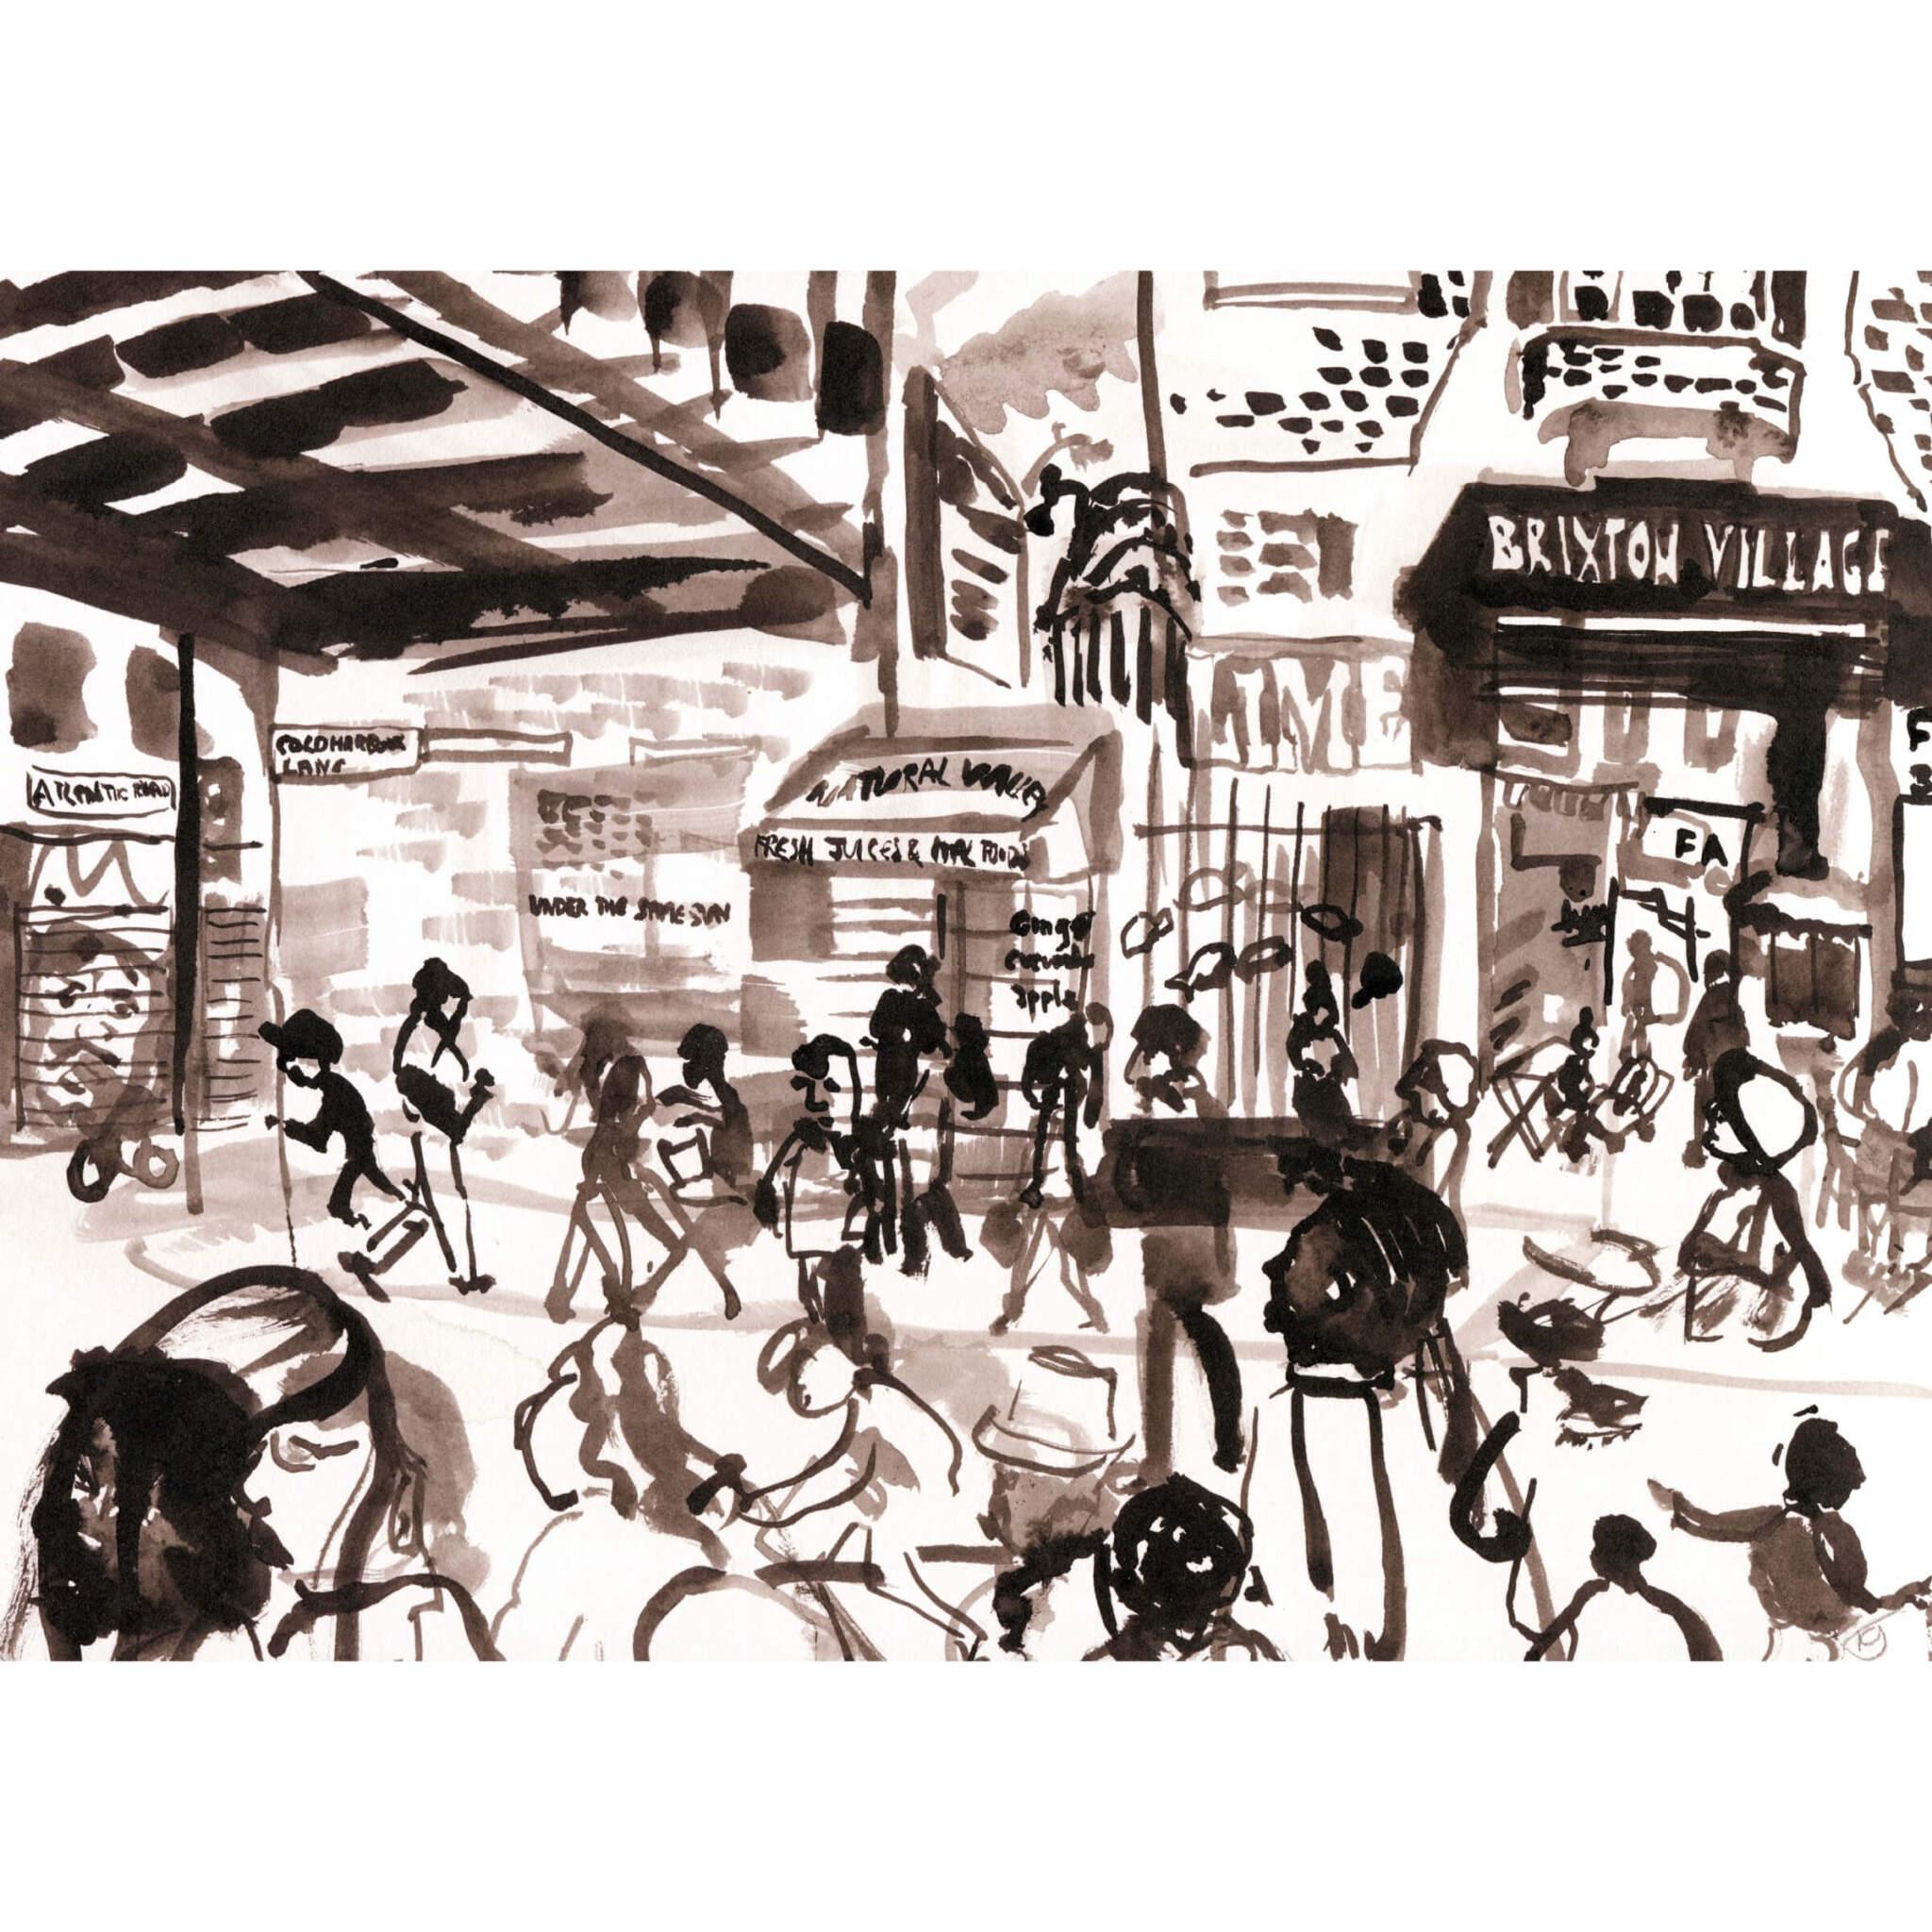 IMG 8750 - Brixton Village Coldharbour Lane by Kirsty Jones